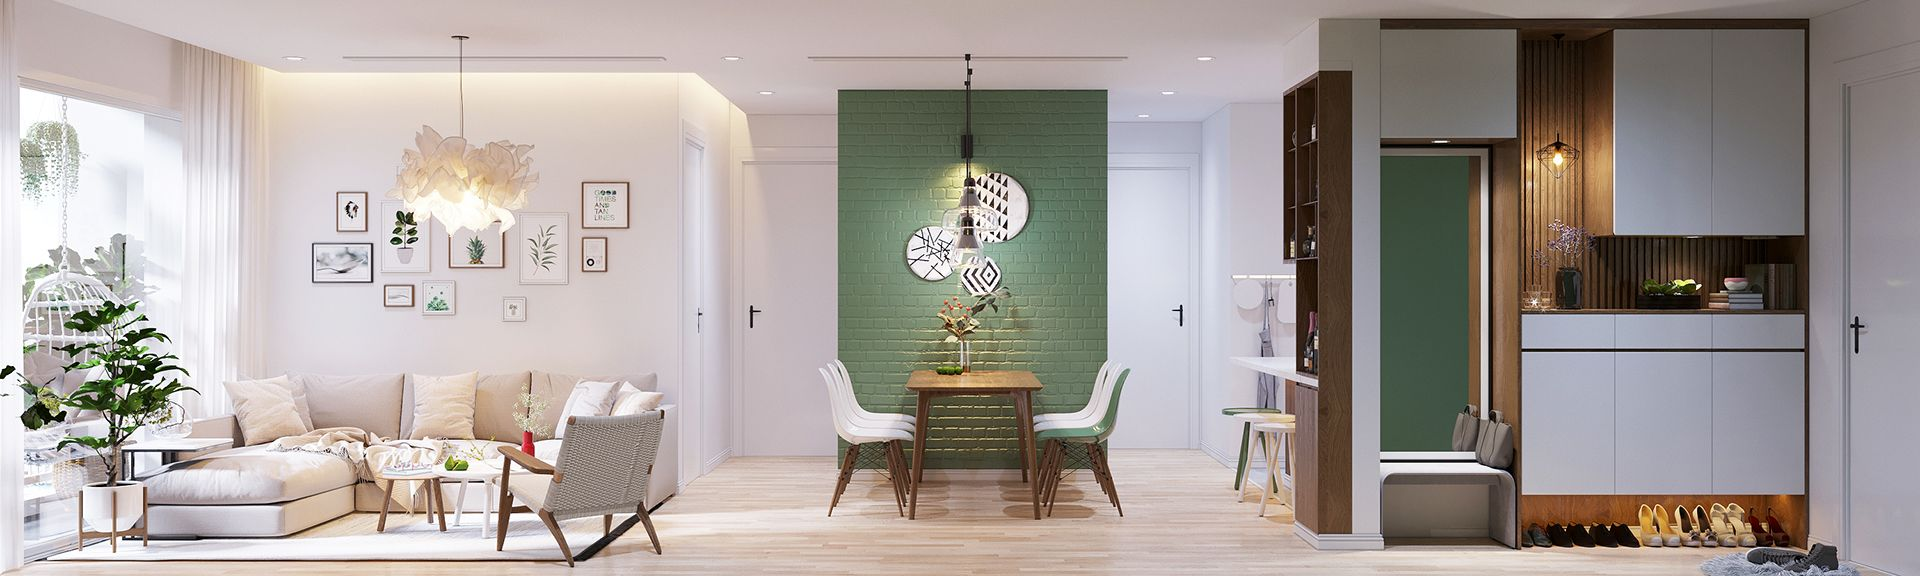 Modern Scandinavian Style Home Design For Young Families 2 Examples Scandinavian Style Home House Design Modern House Design